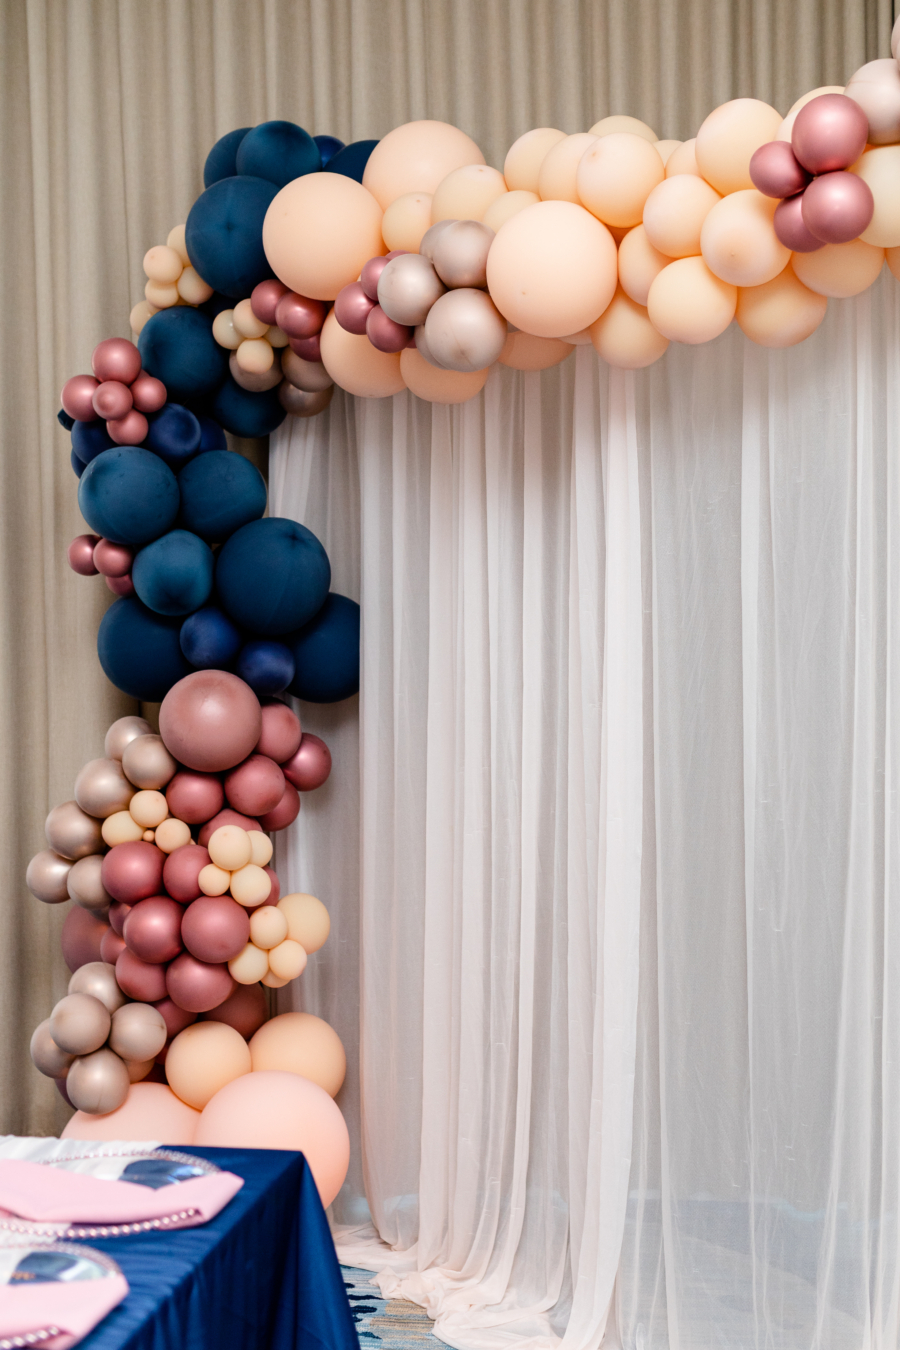 Margaritaville Hotel Nashville wedding balloon arch